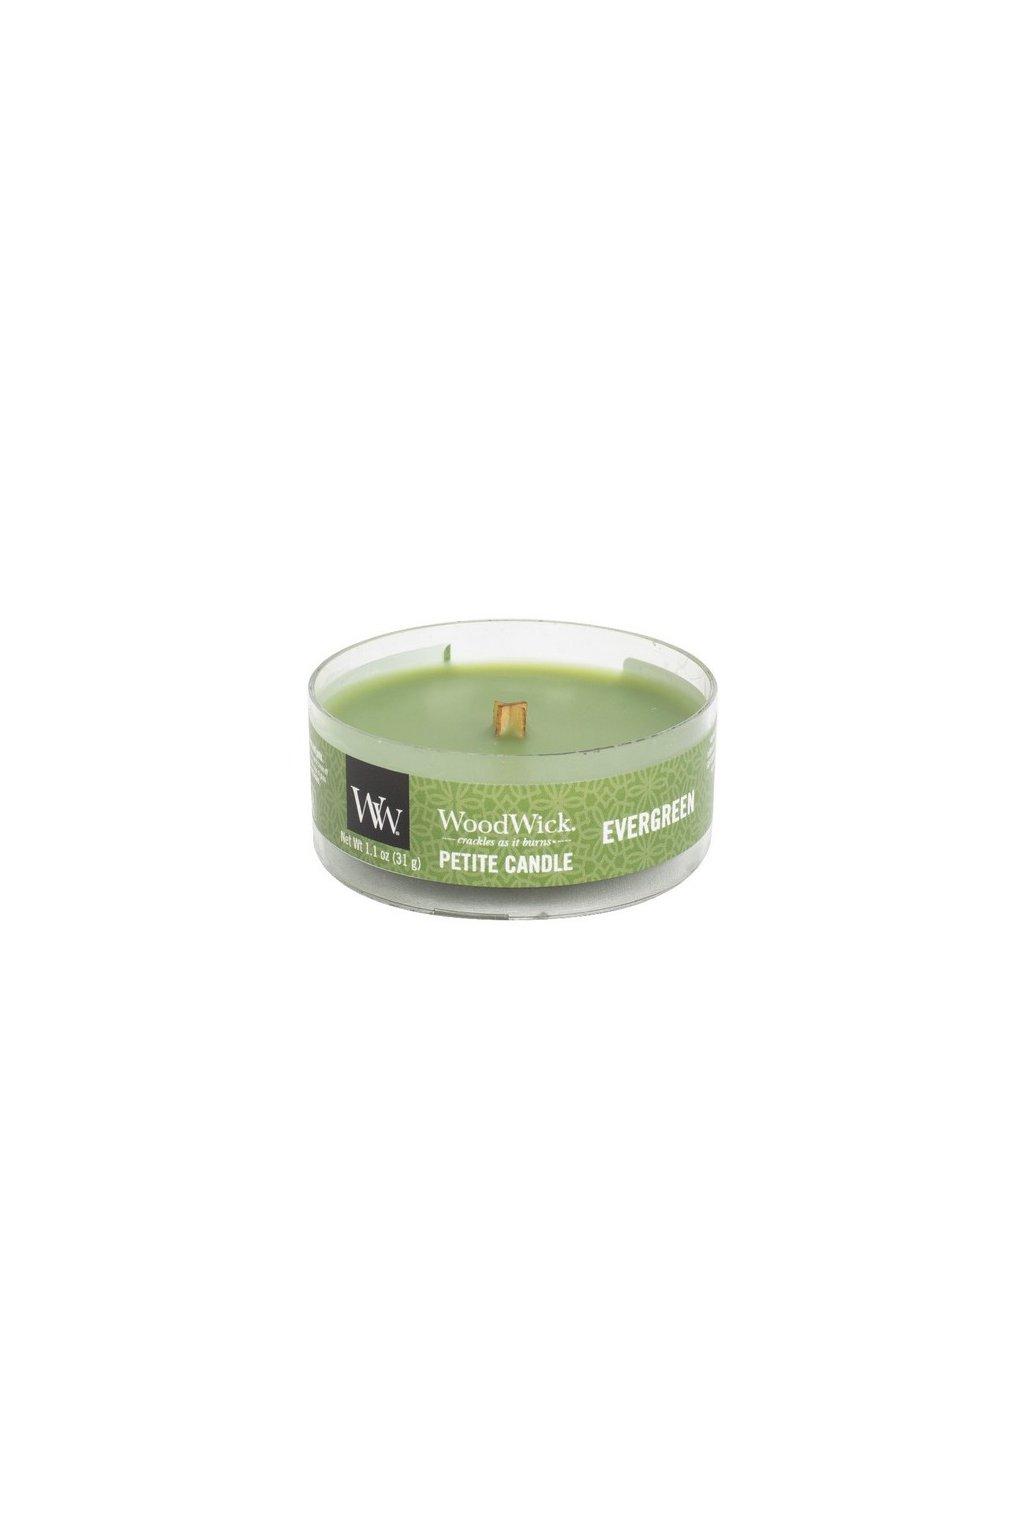 WoodWick Evergreen petite